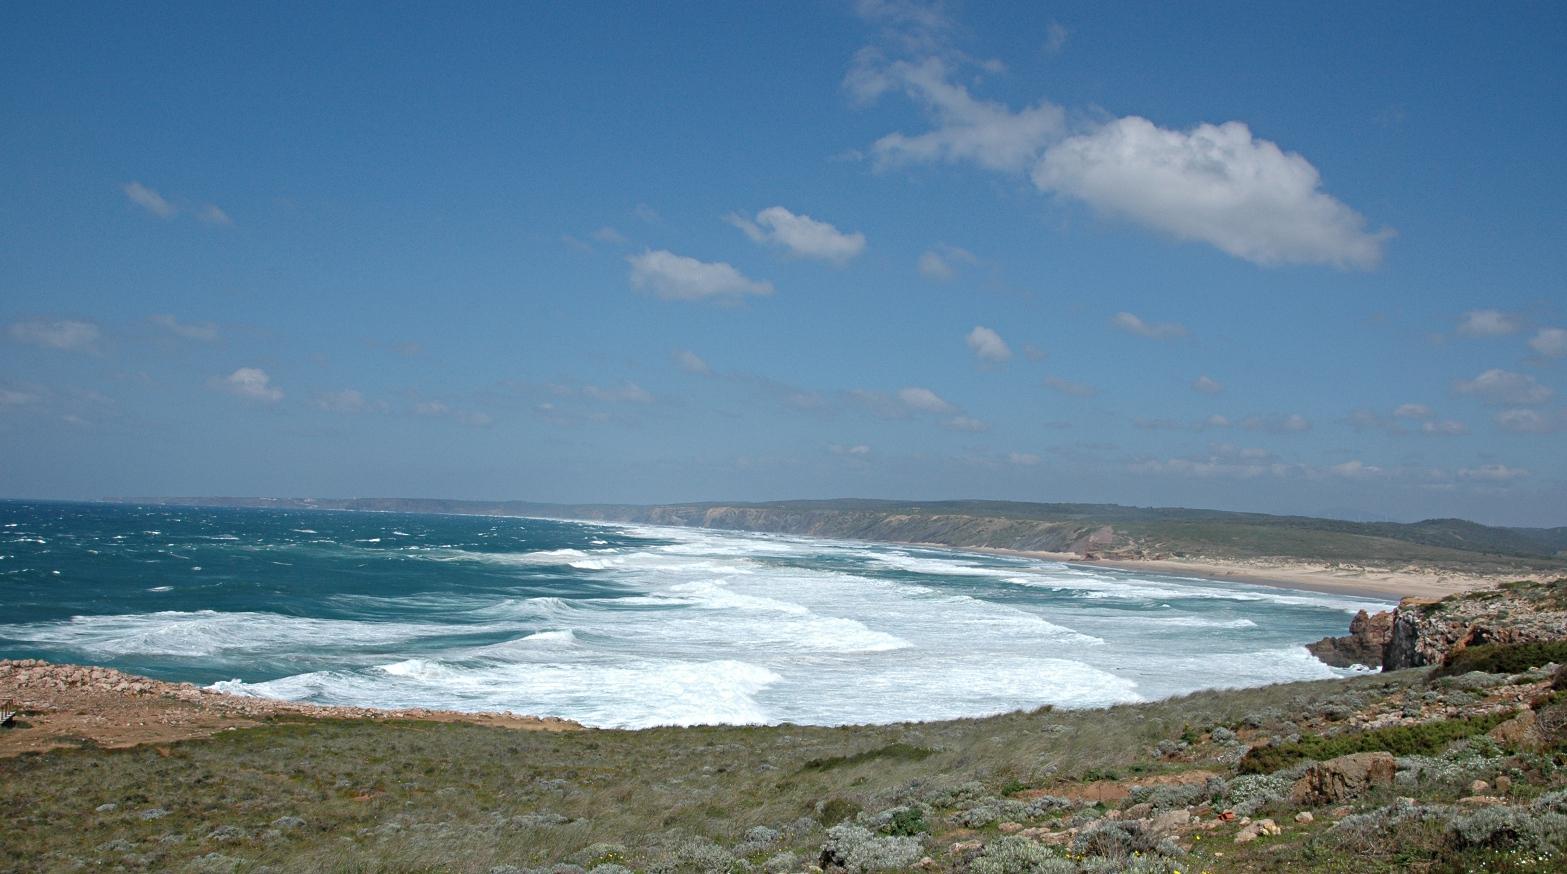 Die Westküste Portugals